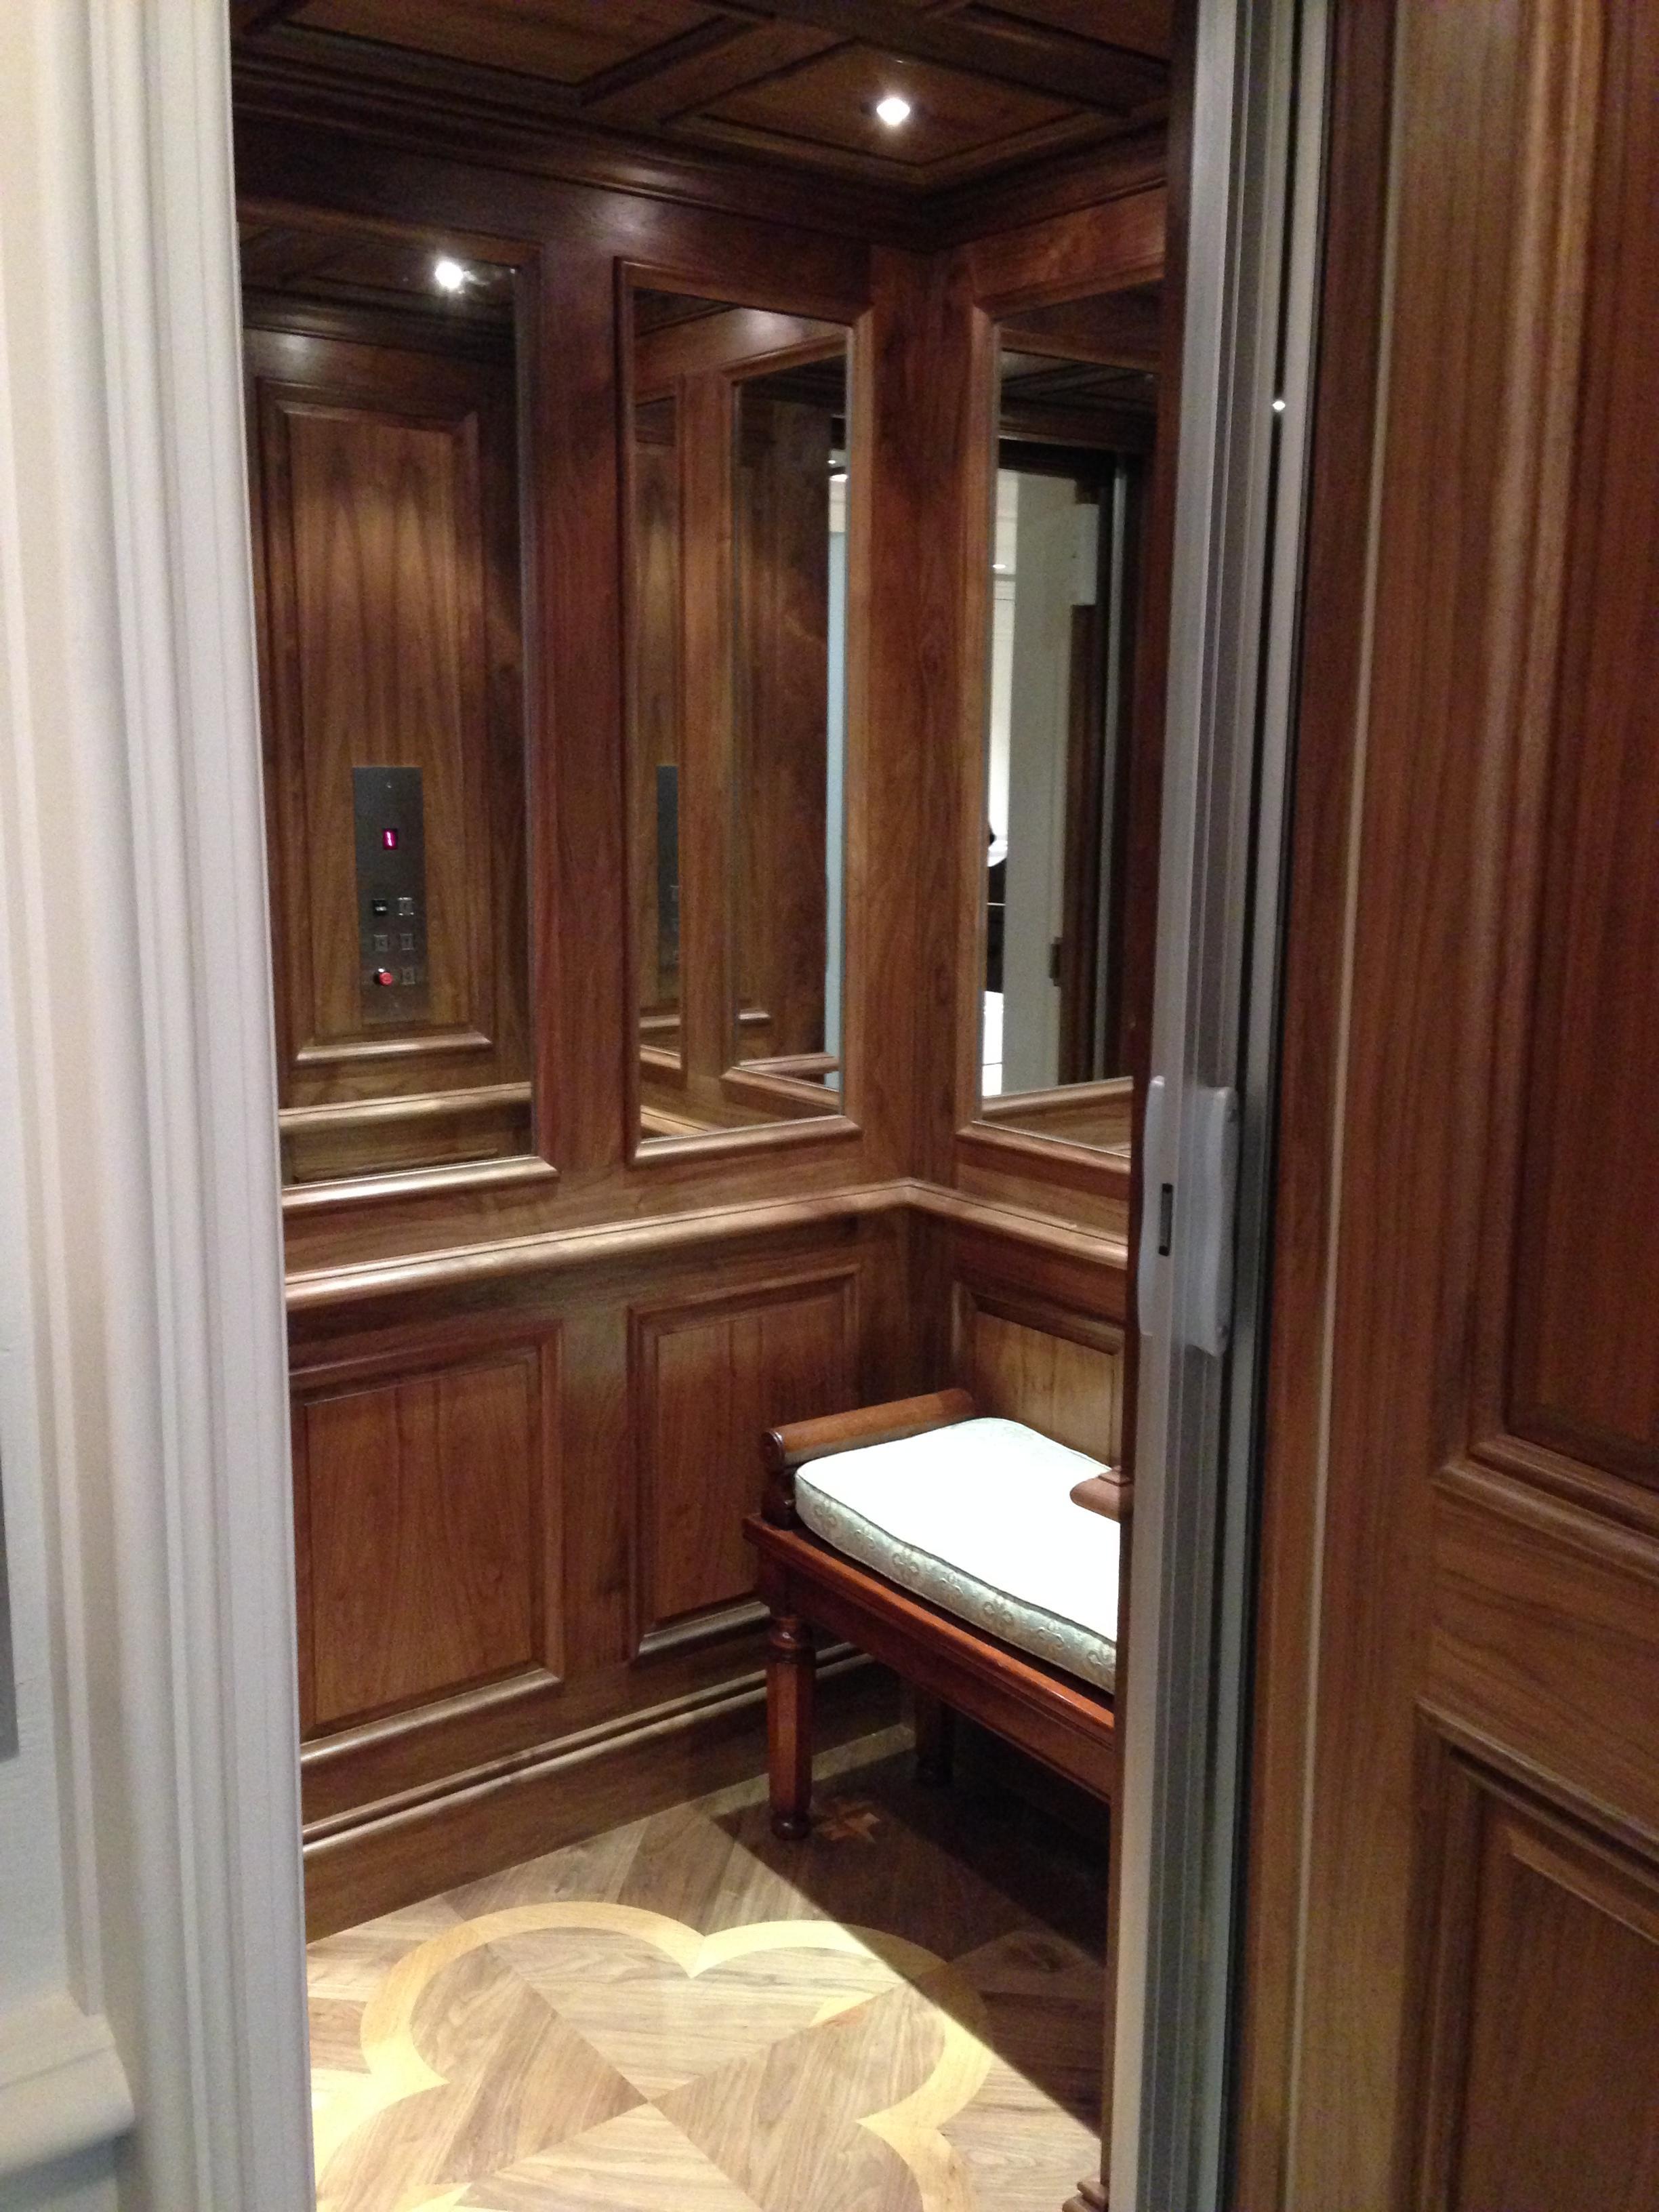 Islamorada Elevator Co. image 2